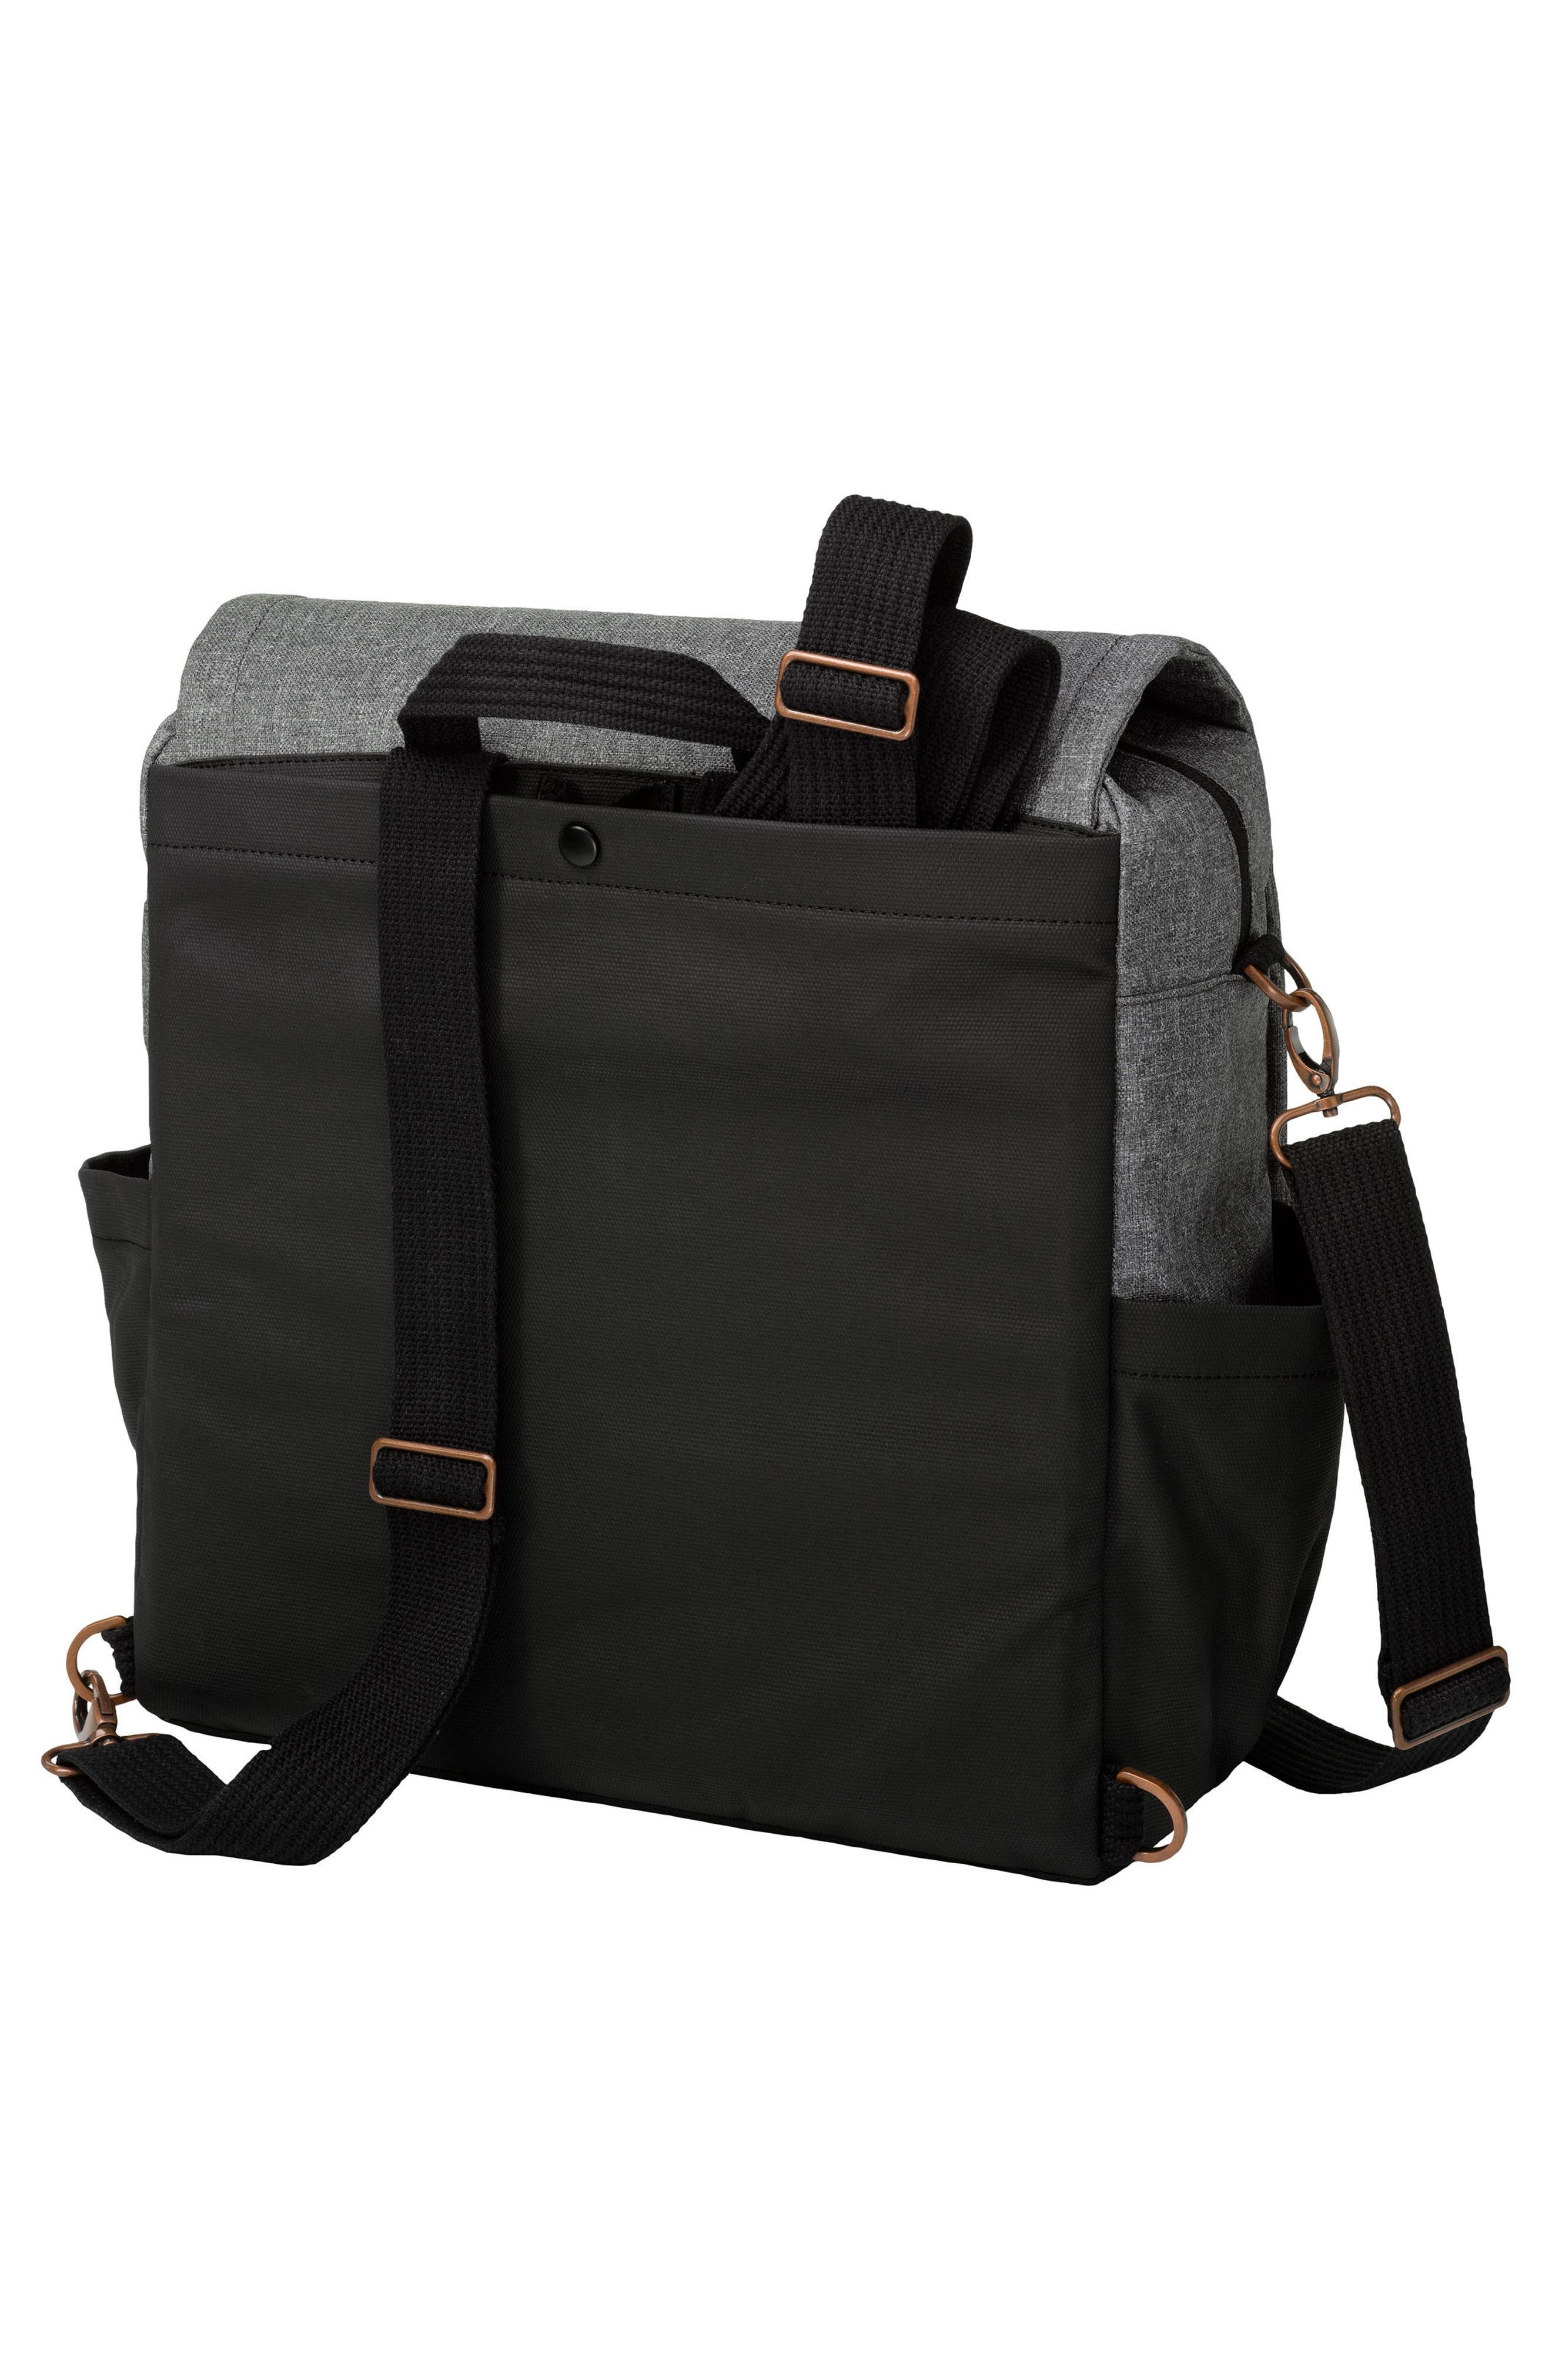 Boxy Backpack Diaper Bag,                             Alternate thumbnail 2, color,                             GRAPHITE/ BLACK